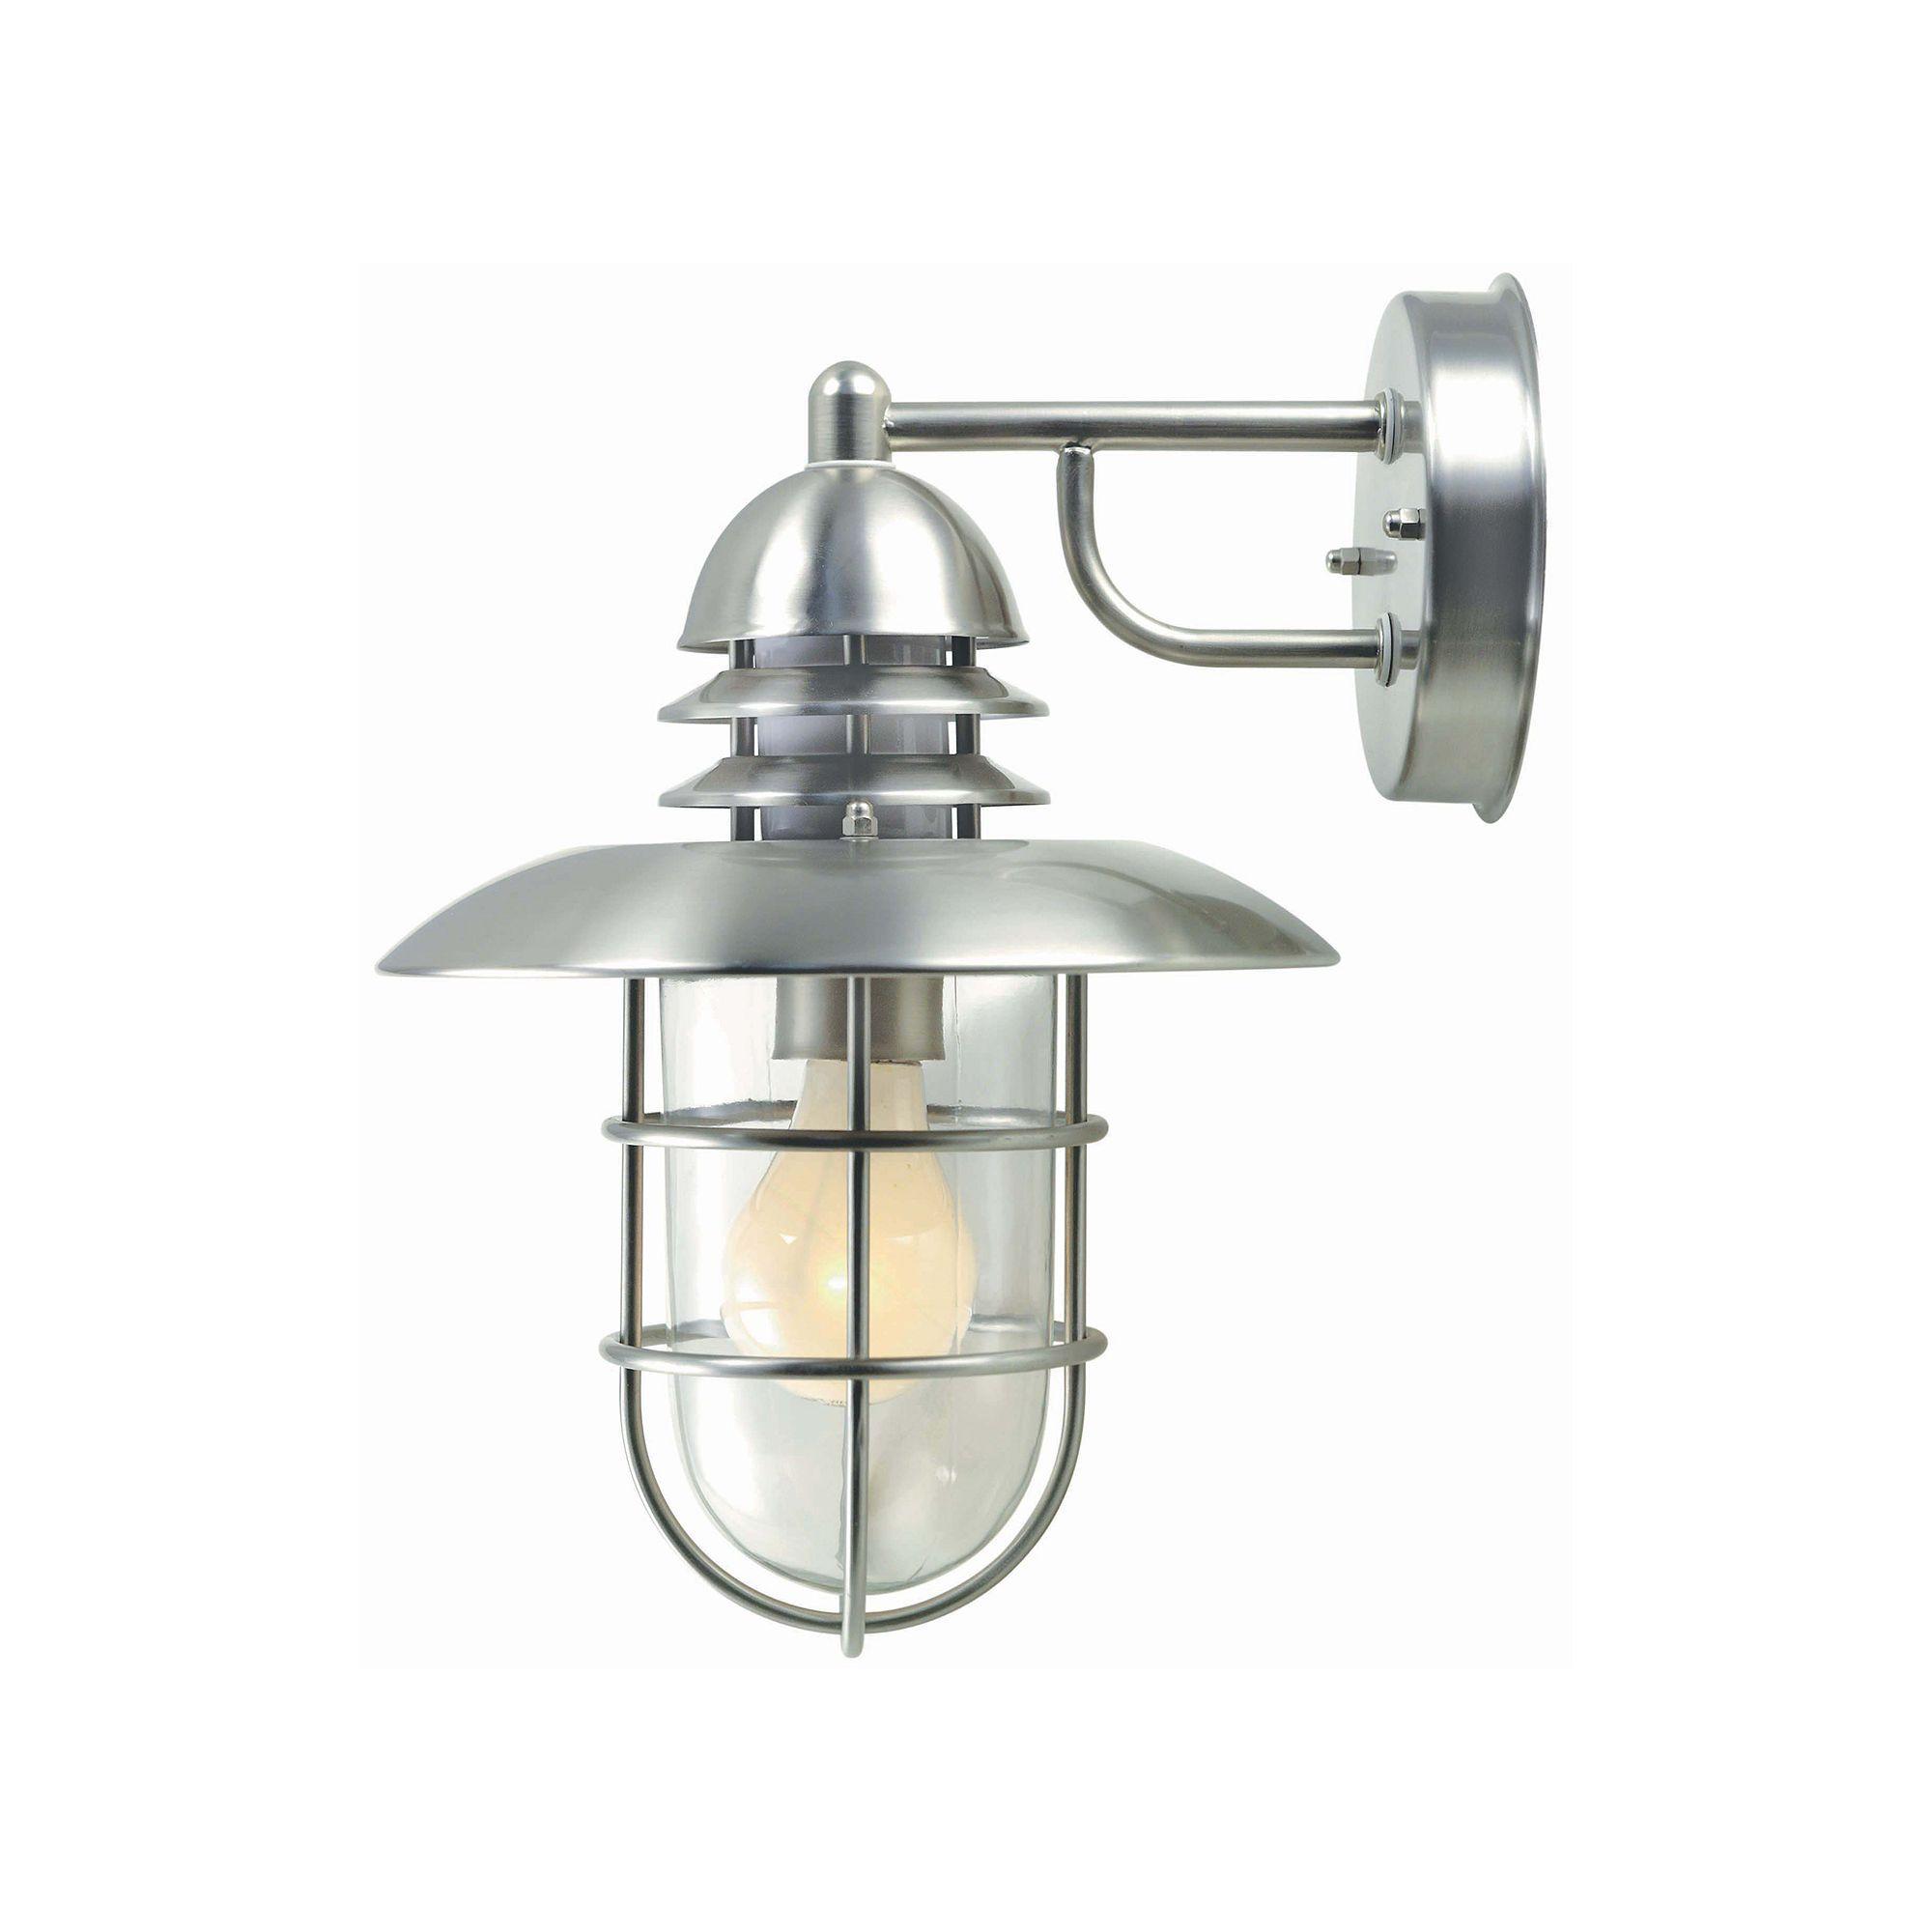 Lamppost Outdoor Wall Lamp Multicolor Outdoor Wall Lamps Outdoor Light Fixtures Outdoor Wall Lantern